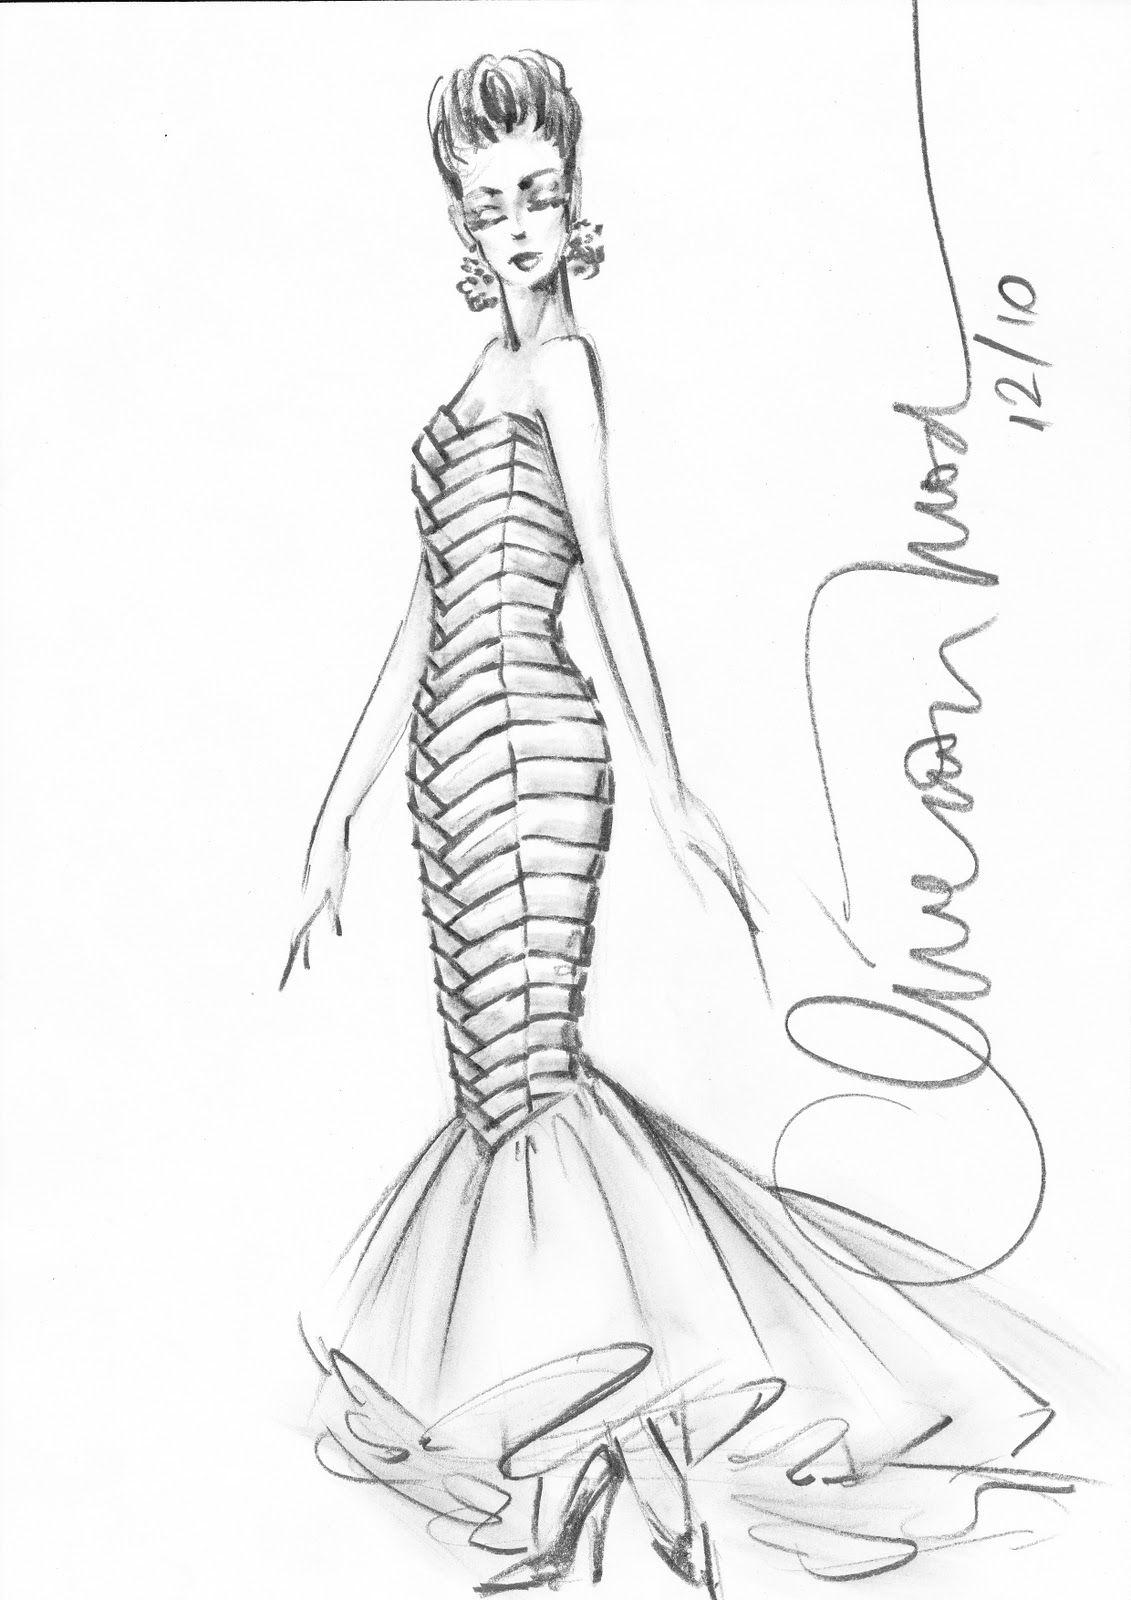 Desenhos De Moda Desenhos De Moda Ilustracao Vestido E Estilos